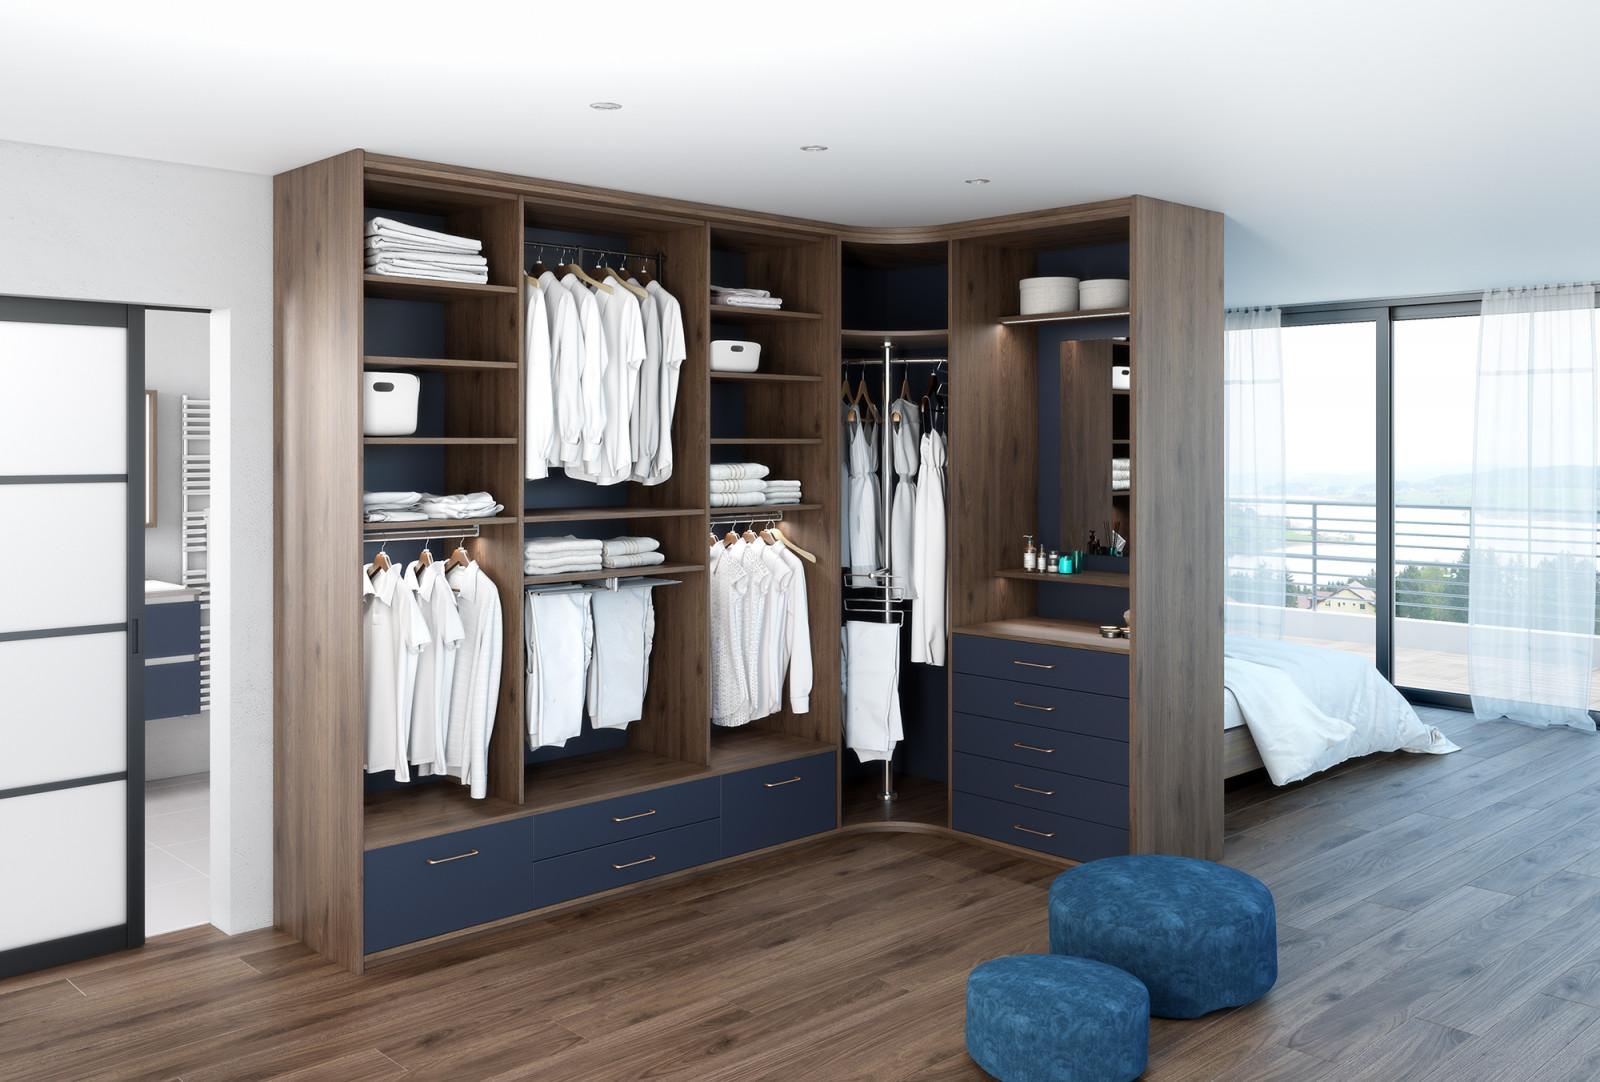 dressing_hacienda-argile_244x144